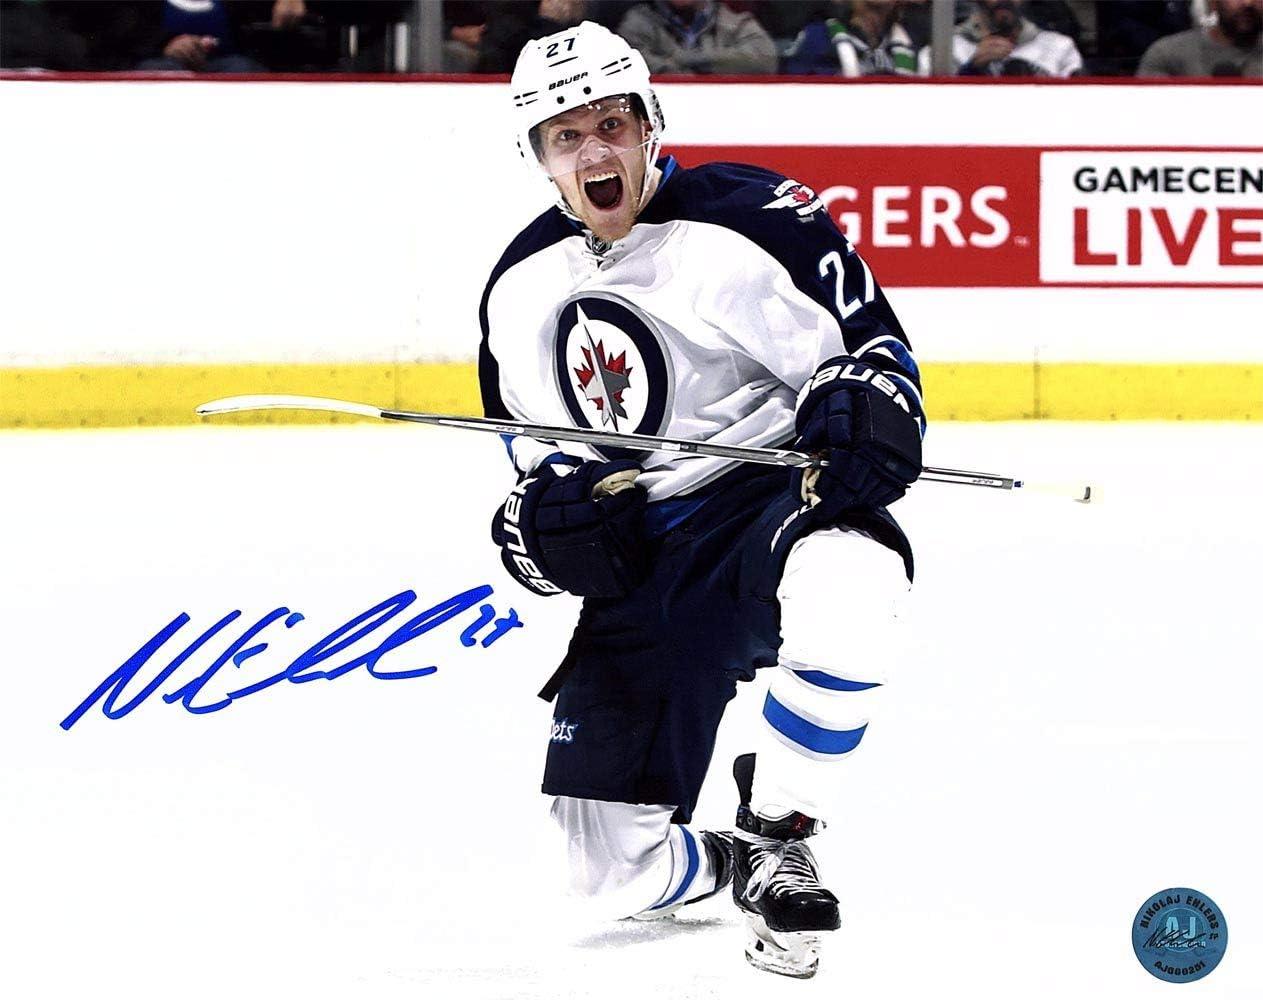 Nikolaj Ehlers Winnipeg Jets Autographed Signed Goal Celebration 11x14 Photo Signature At Amazon S Sports Collectibles Store